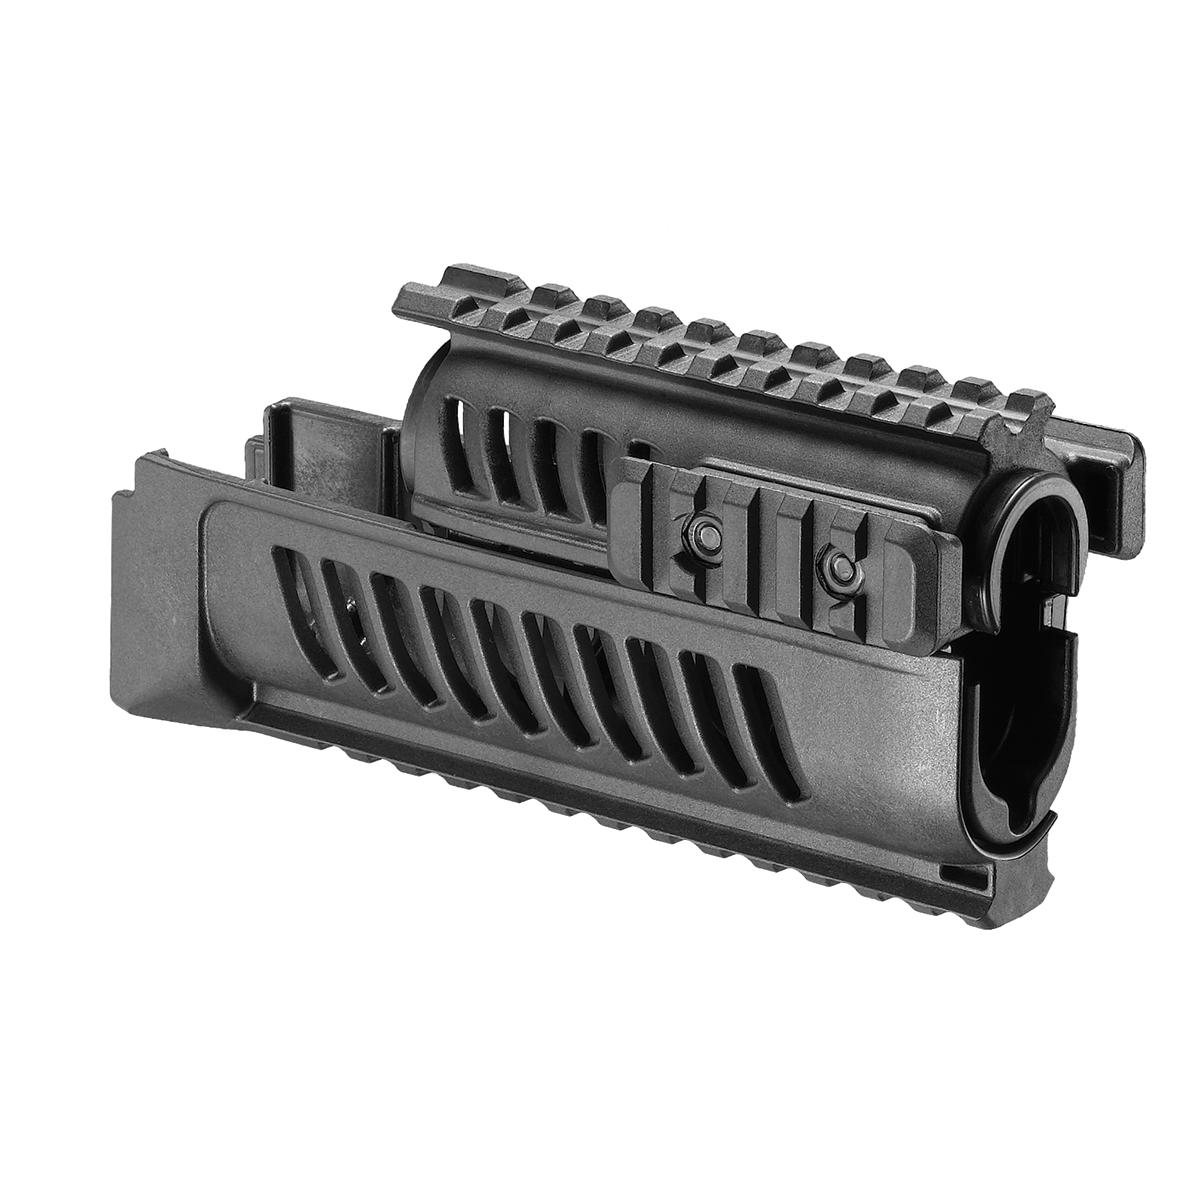 fab-defense-ak-47-handgurad-rail-system-black